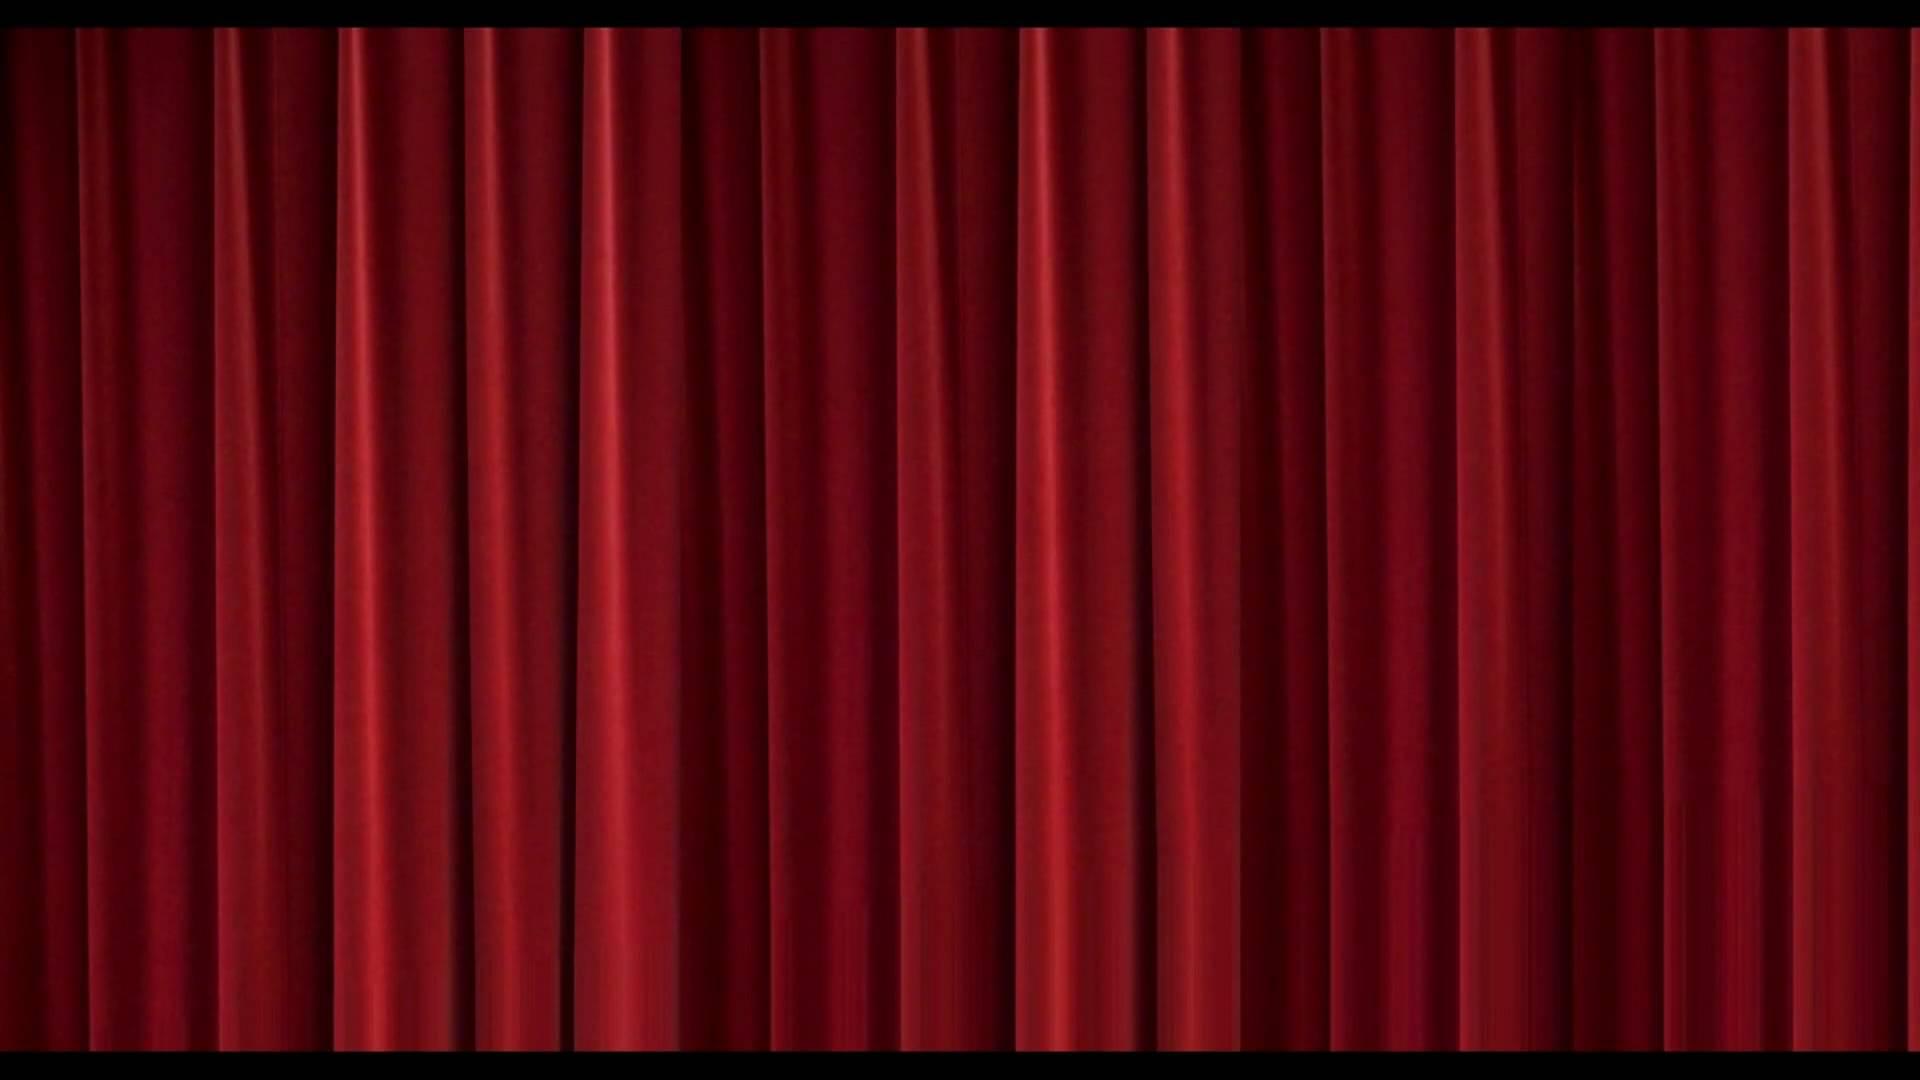 Curtain clipart home theater (Animated) Art Movie Art Clip